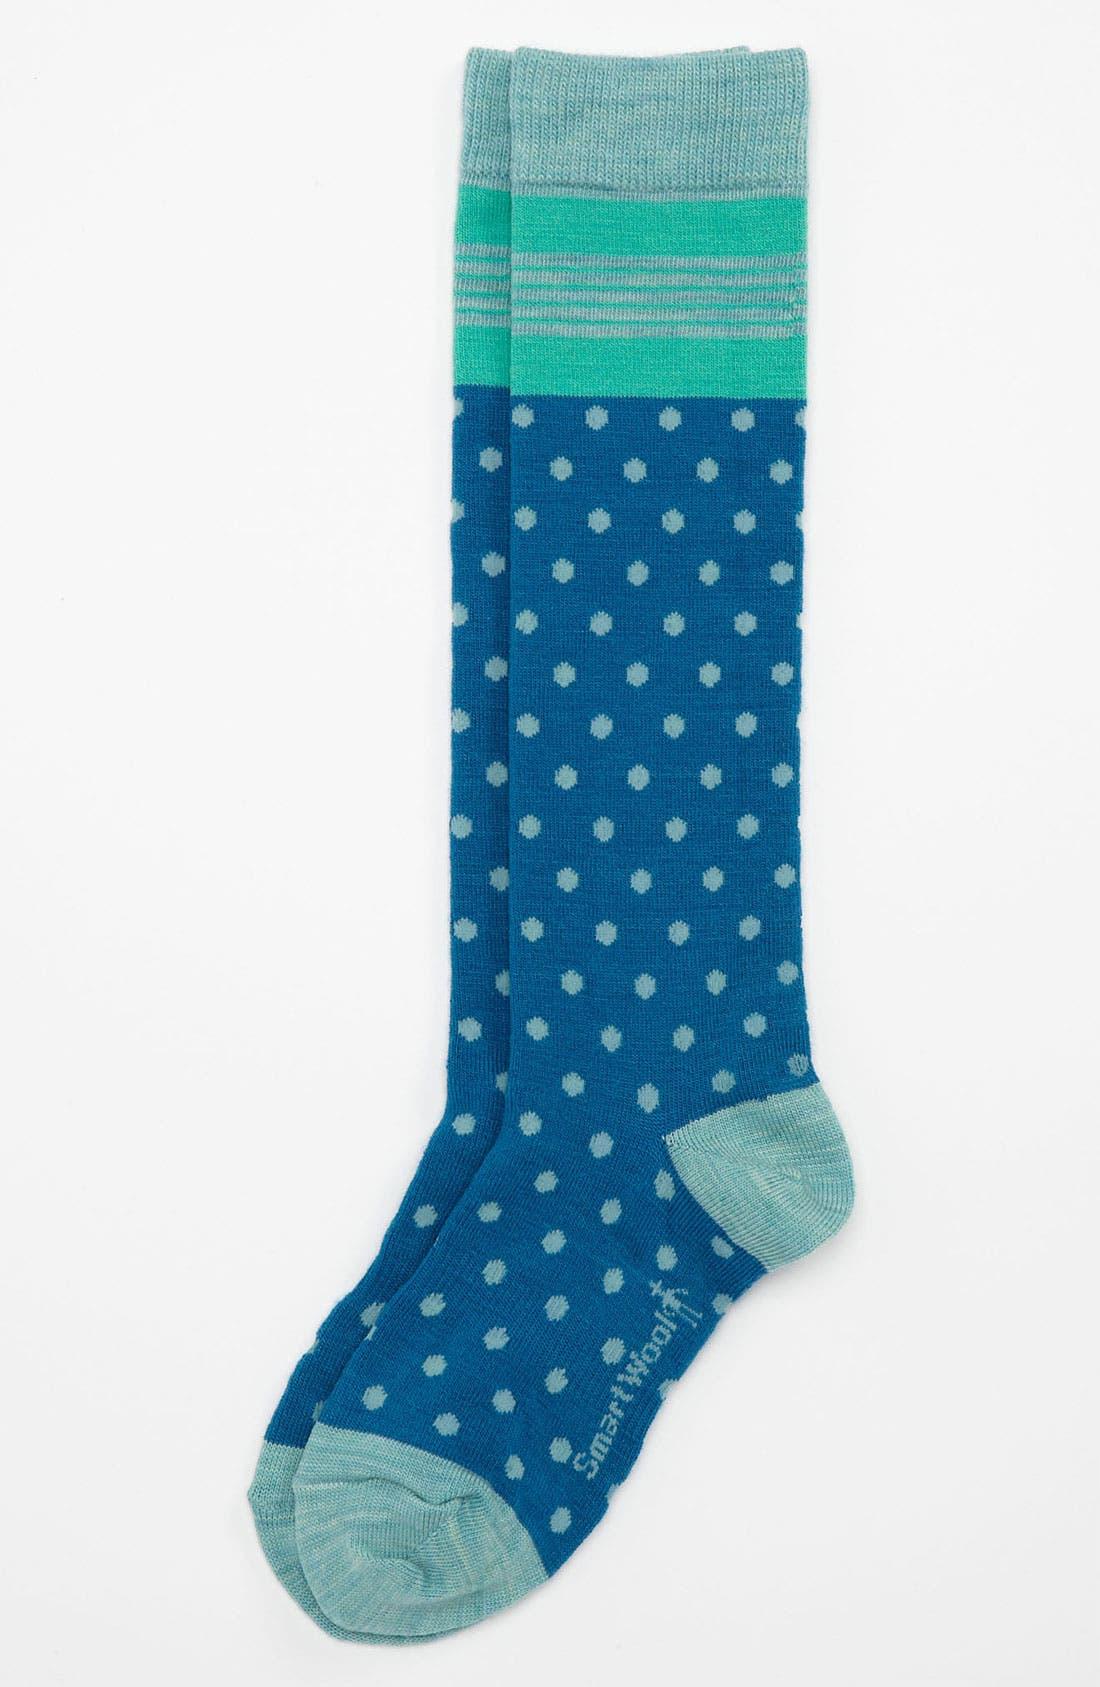 Main Image - Smartwool 'Oui Mademoiselle' Knee Socks (Little Girls & Big Girls)